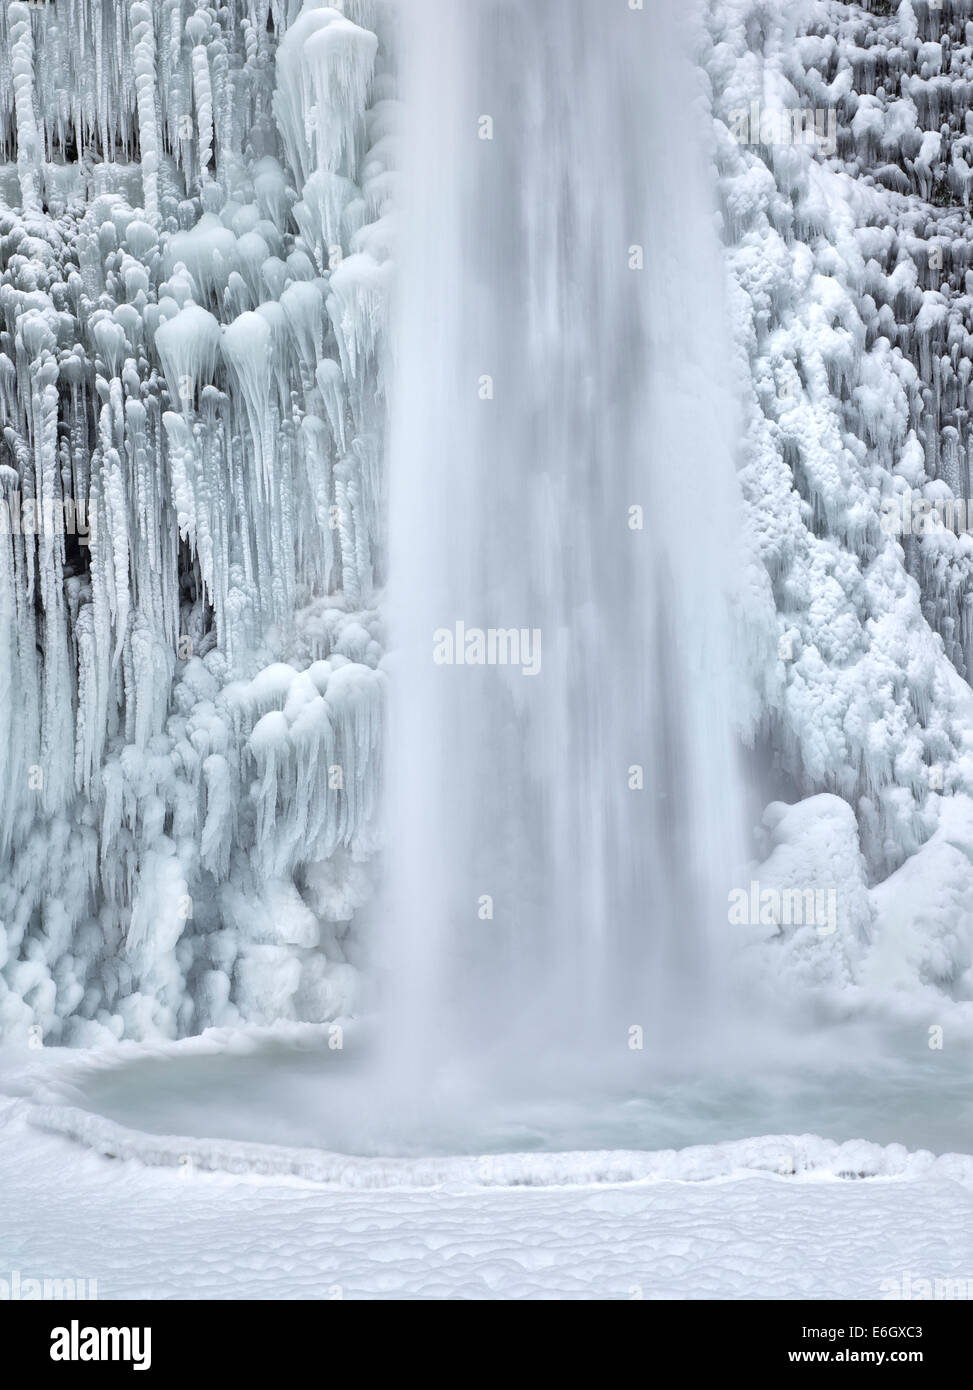 Cerca de Equiseto o cola de caballo cae con hielo y nieve. Columbia River Gorge National Scenic Area, Oregón Imagen De Stock